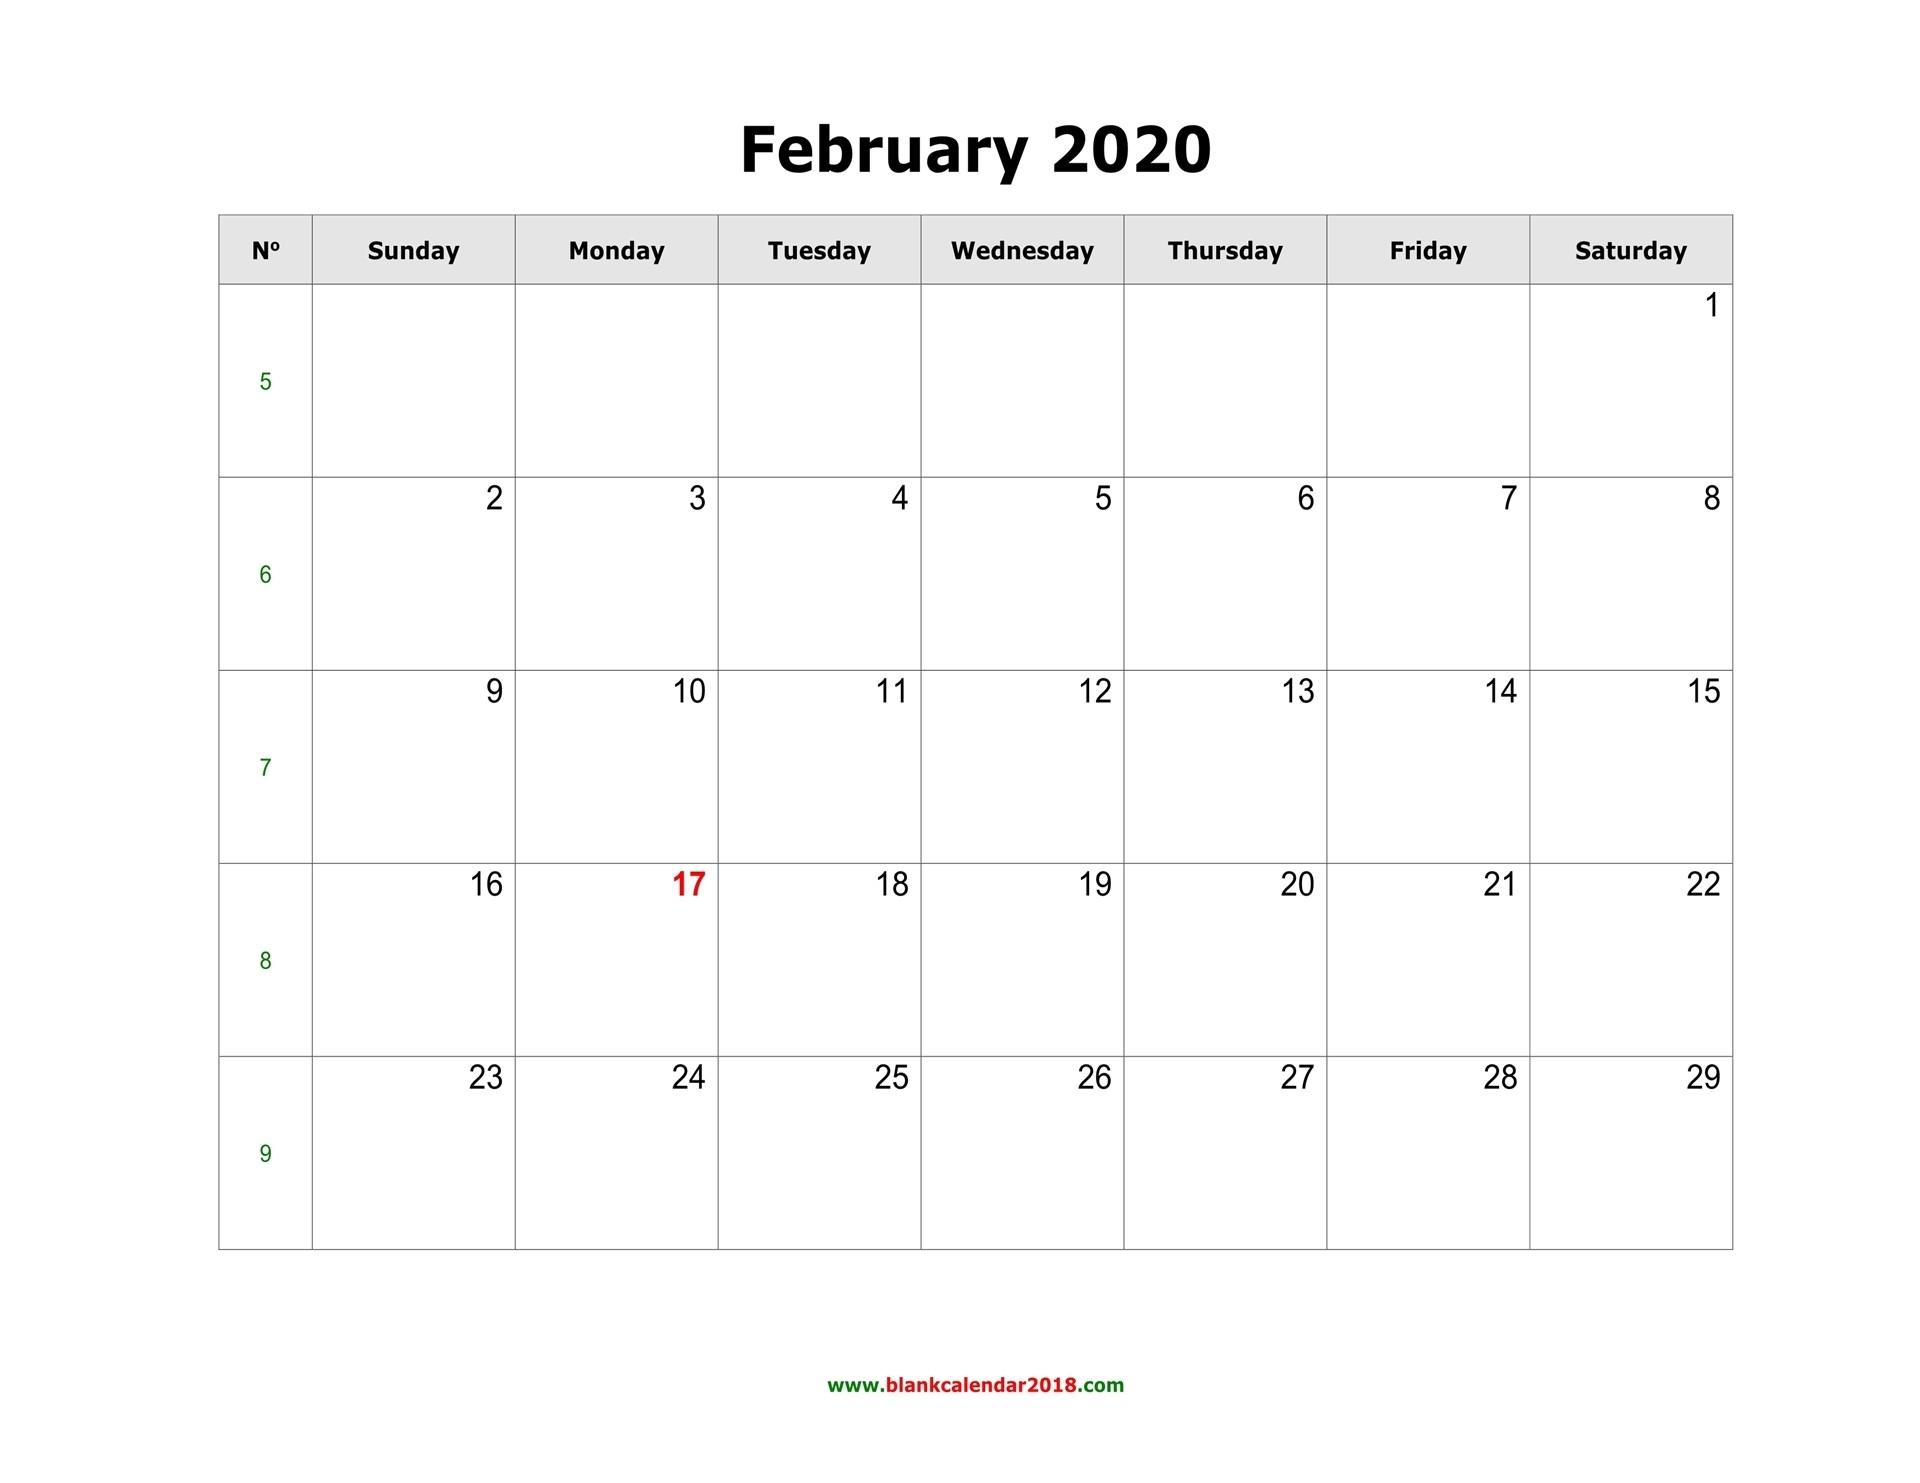 Blank Calendar For February 2020  February Blank Calendar Printable